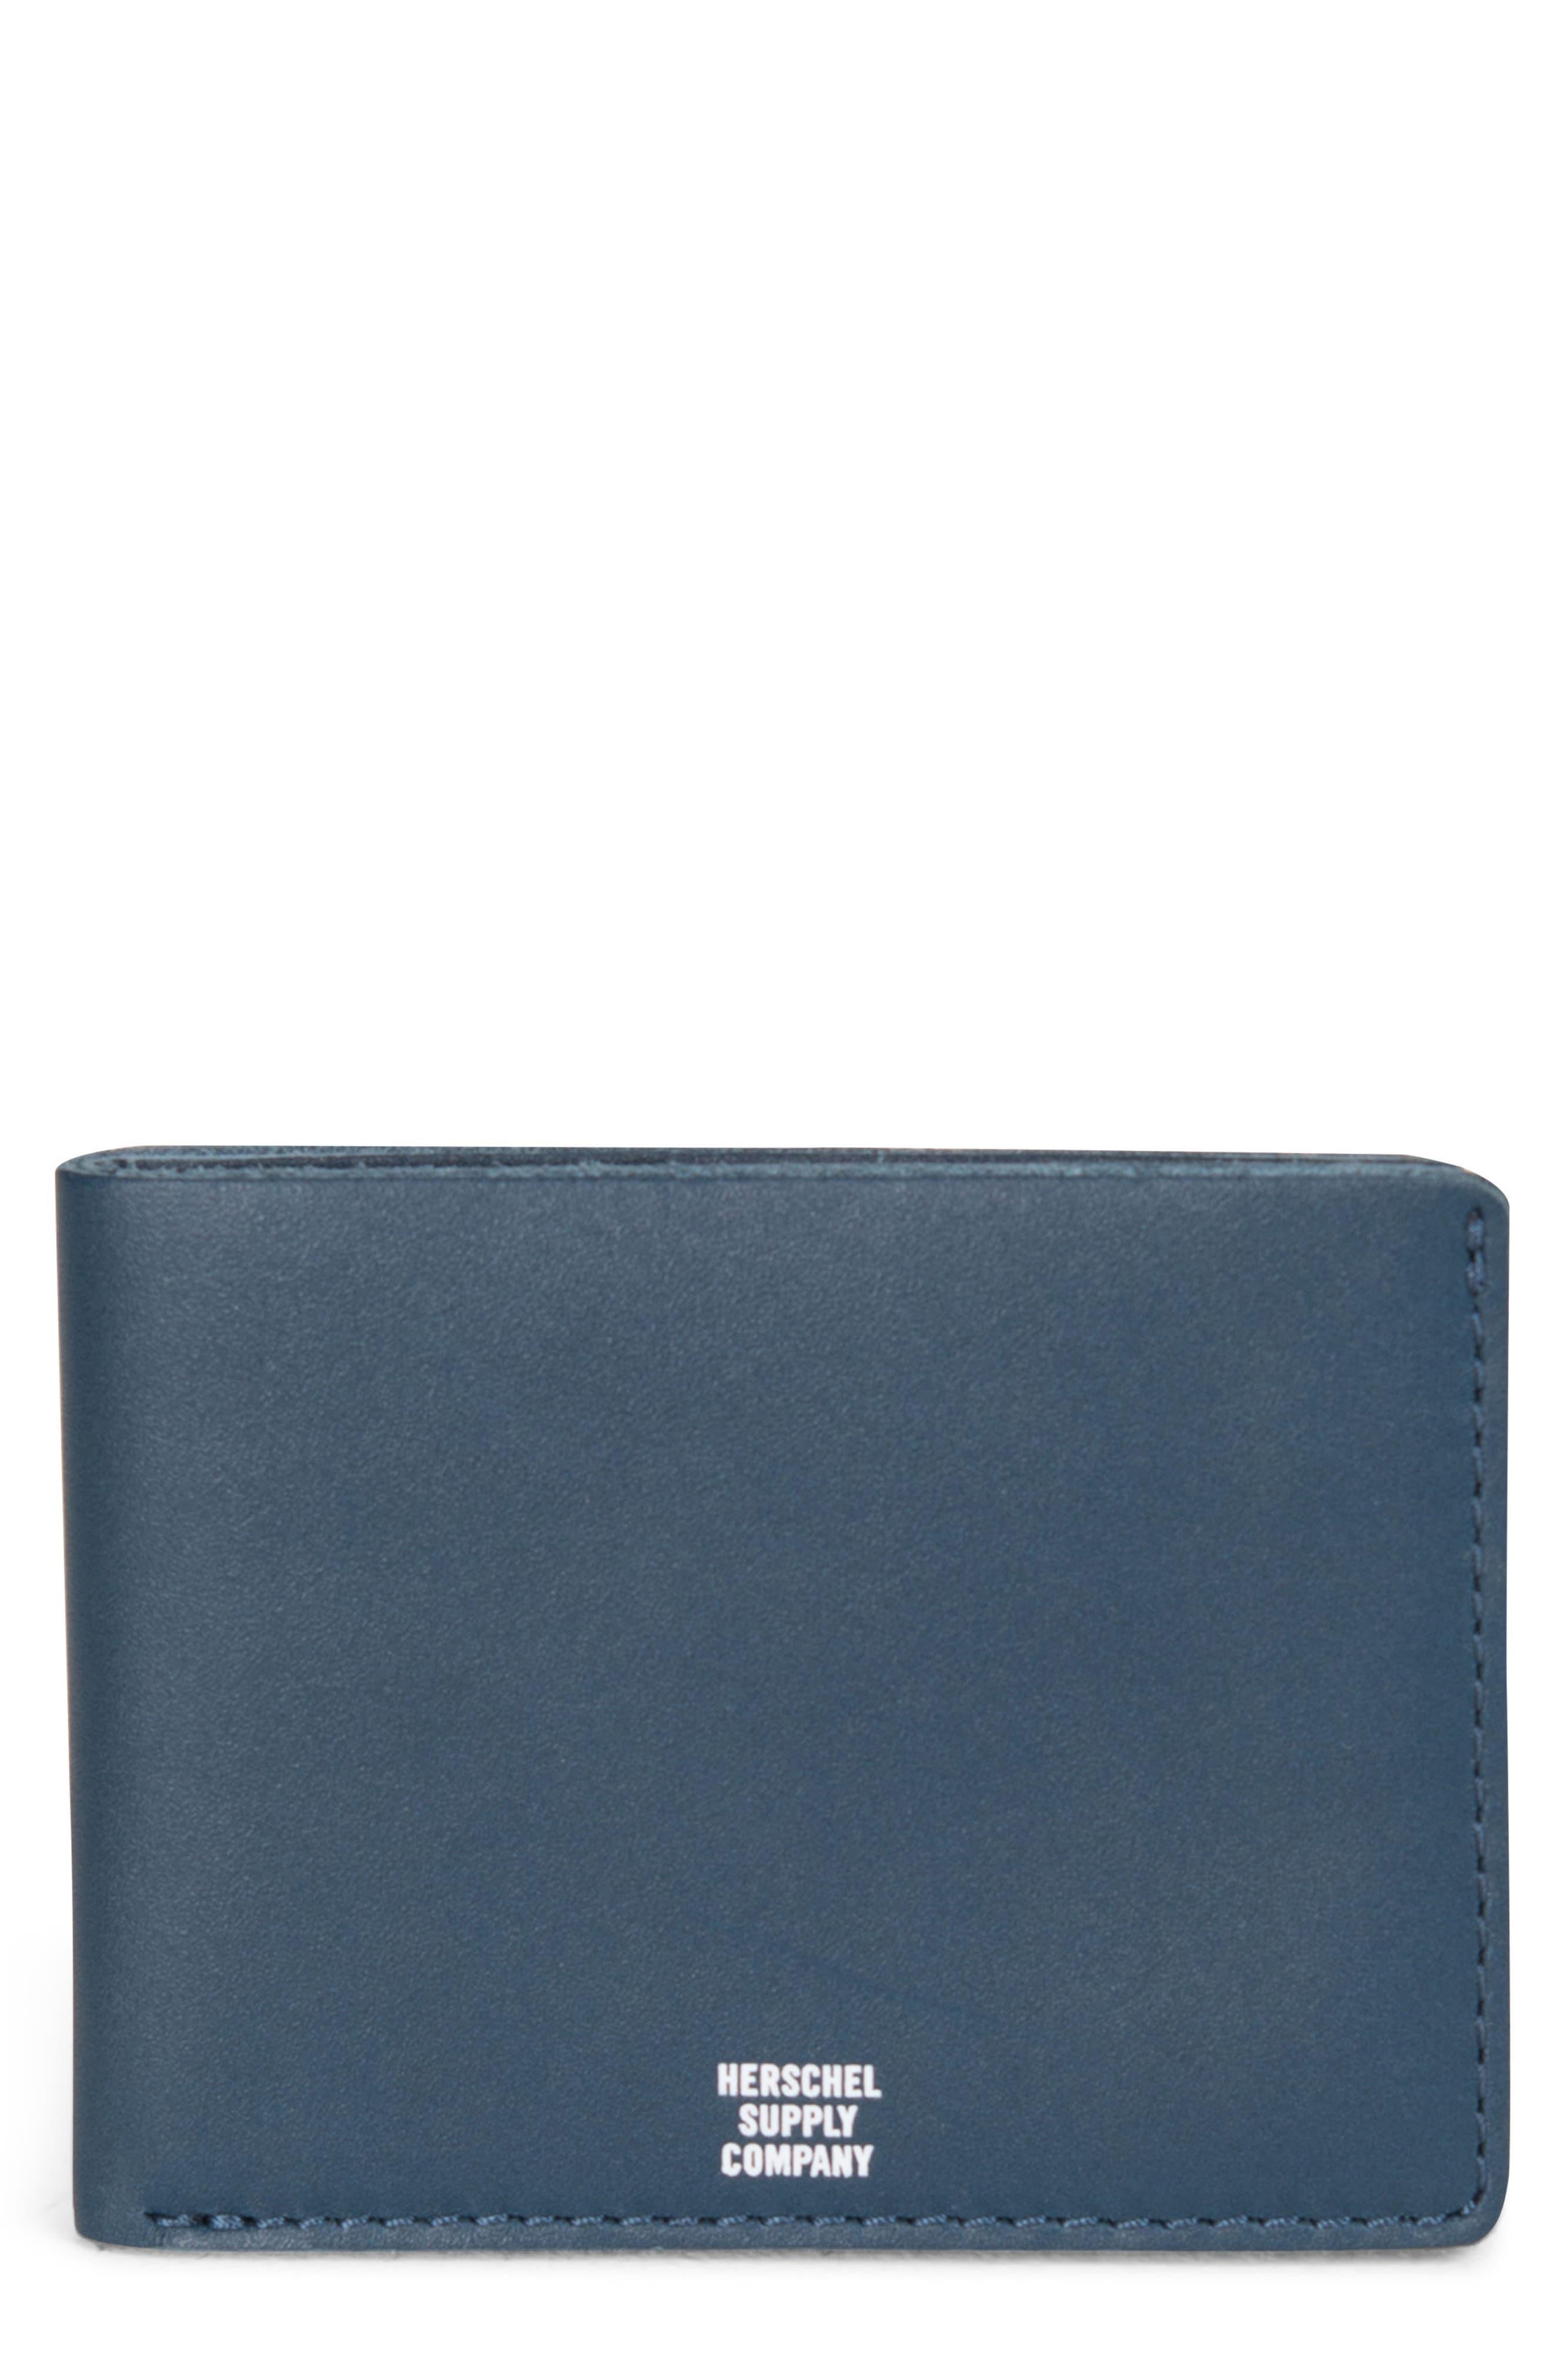 Herschel Supply Co. Miles Leather Wallet